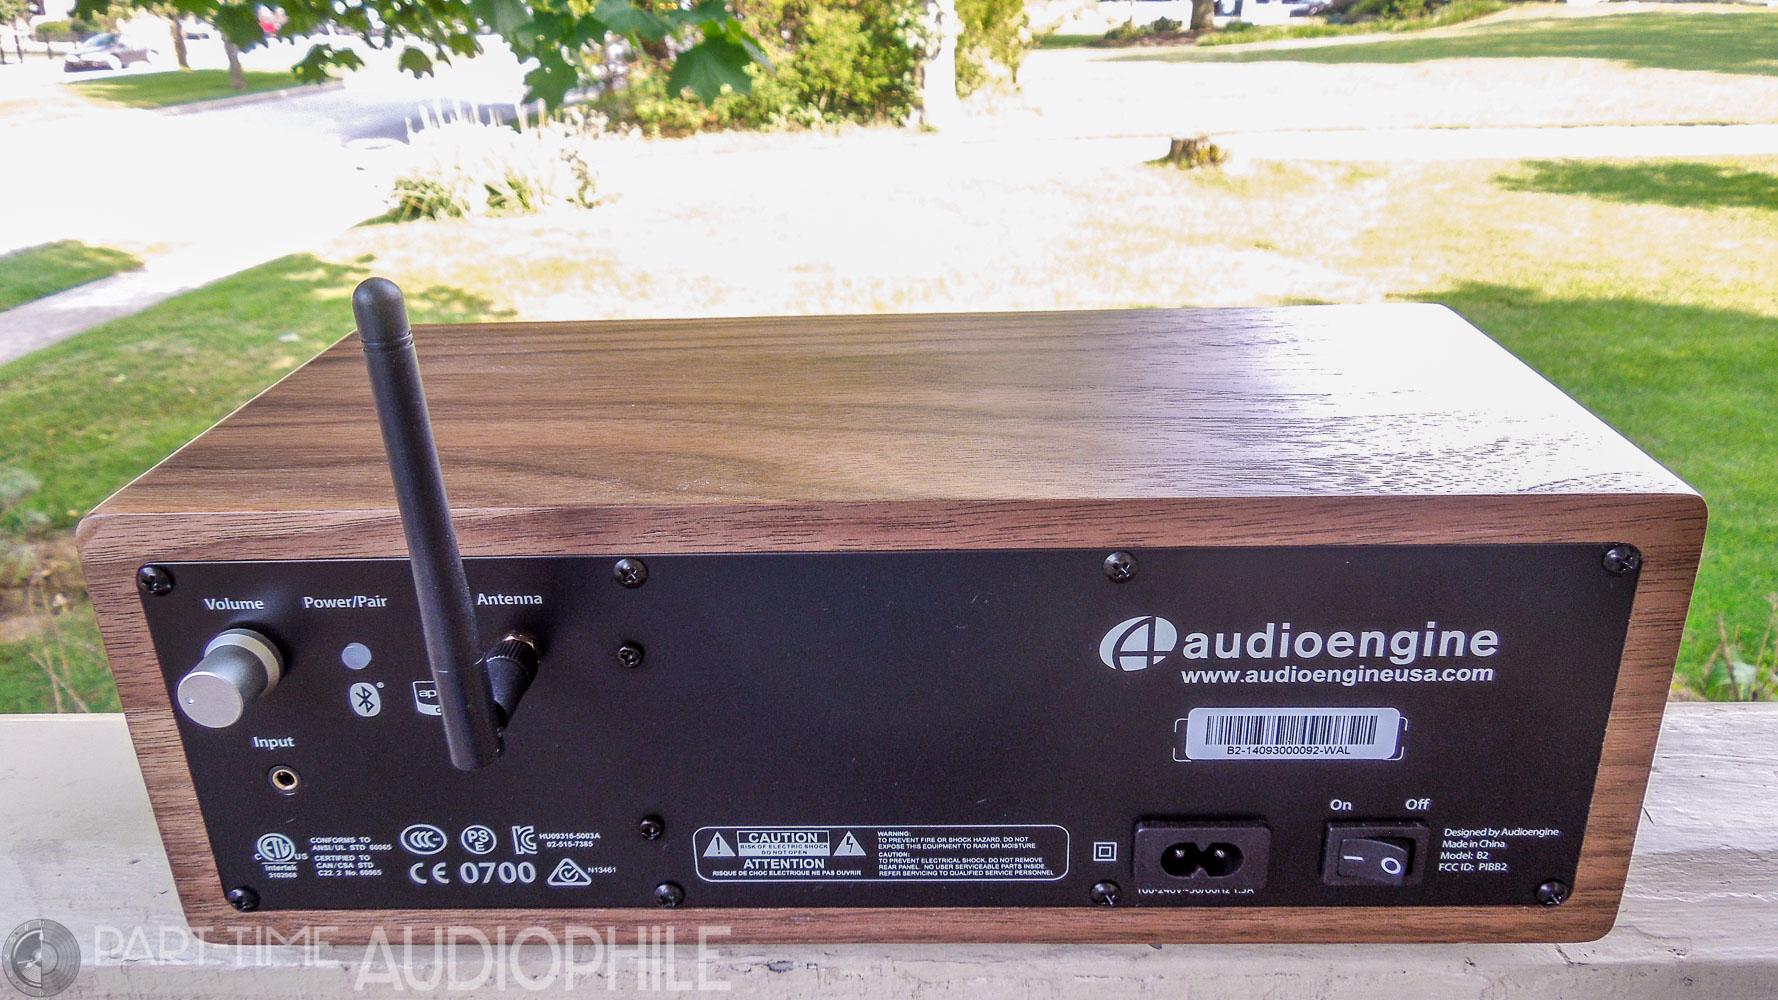 Audioengine-Peachtree-1007